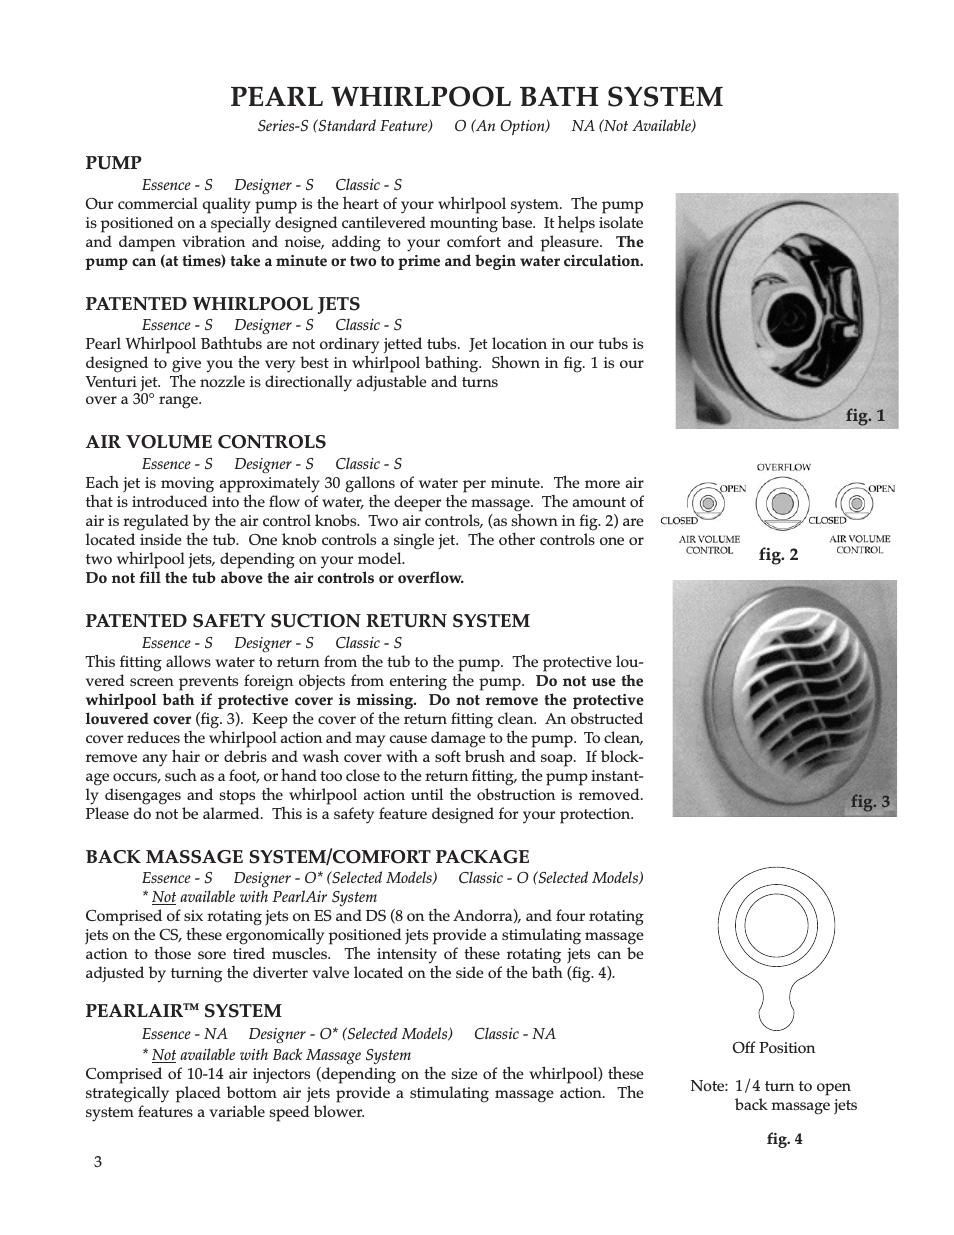 whirlpool maax pearl hot tub page=4